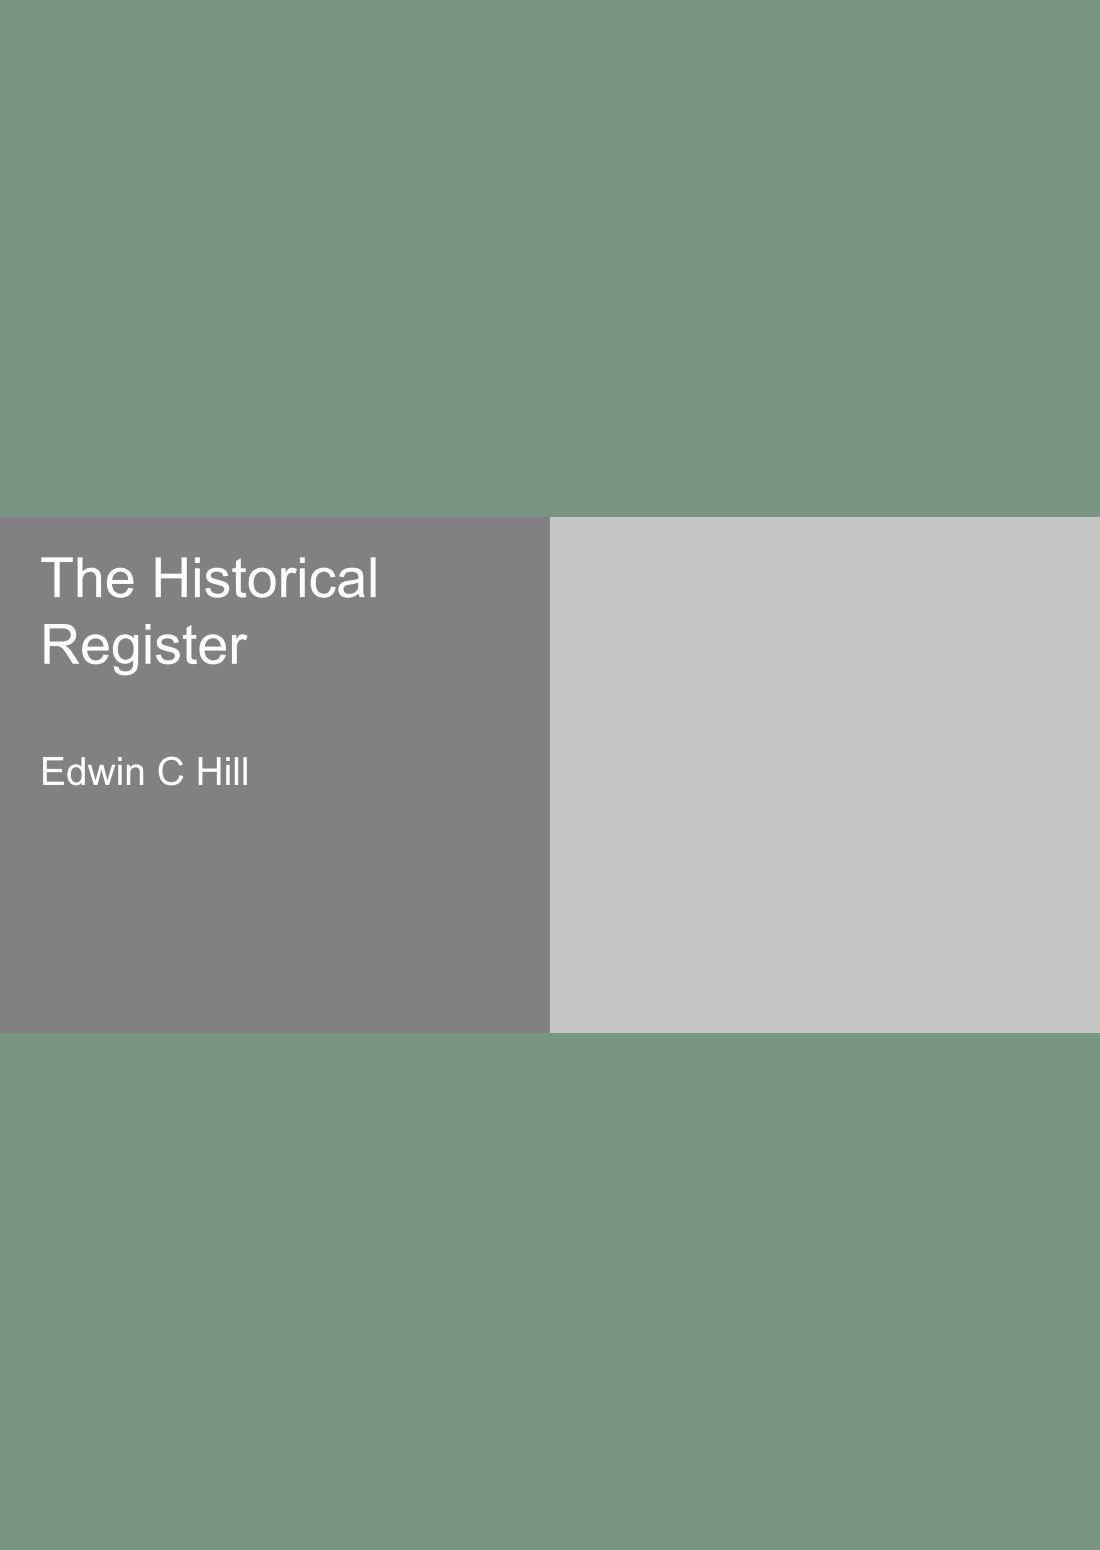 Download The Historical Register ebook